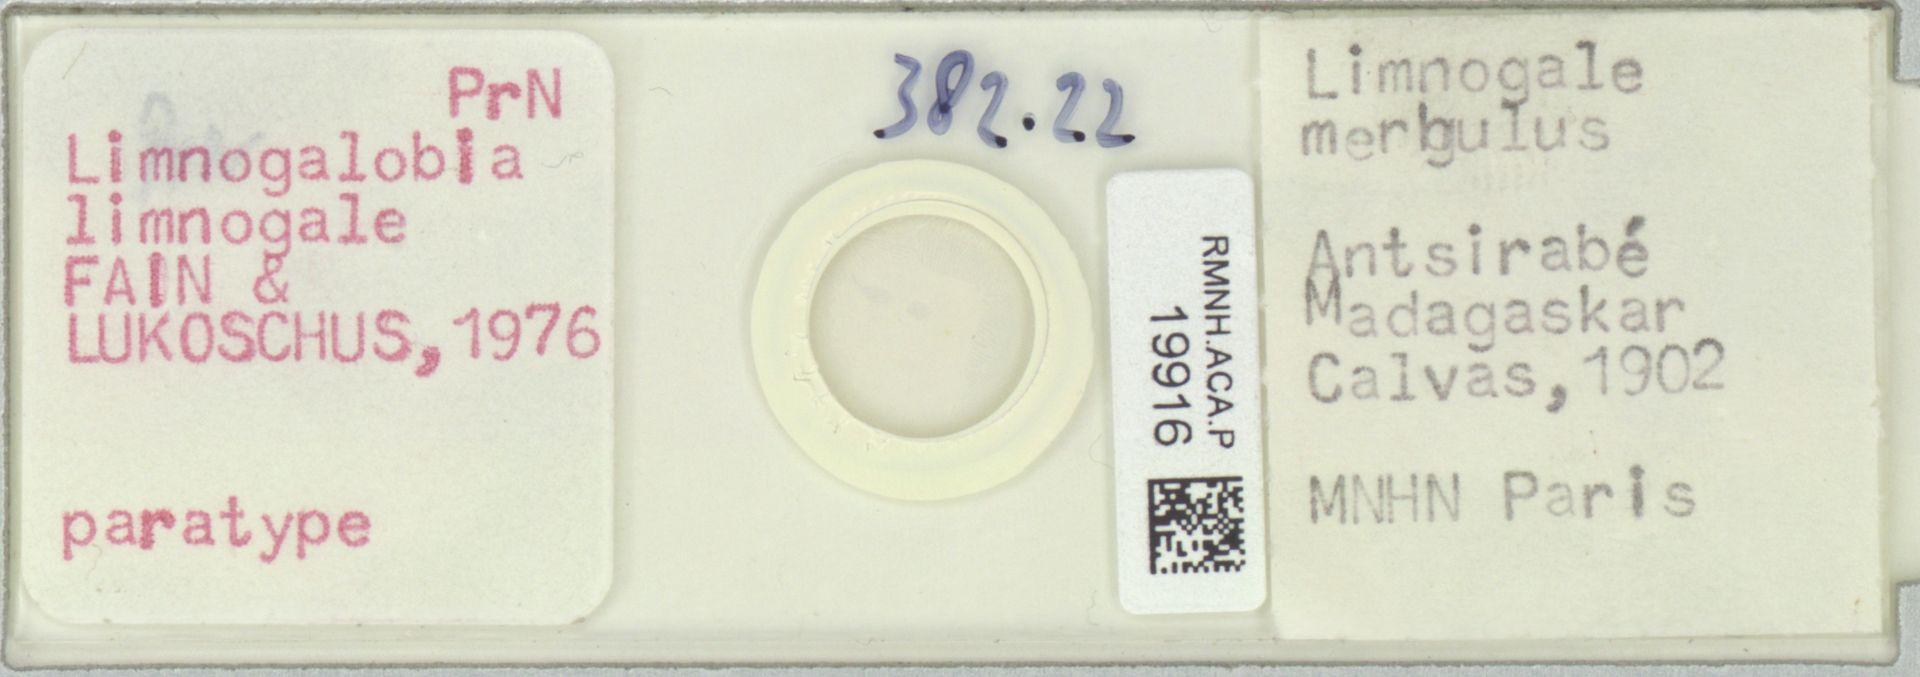 RMNH.ACA.P.19916 | Limnogalobia limnogale Fain & Lukoschus, 1976